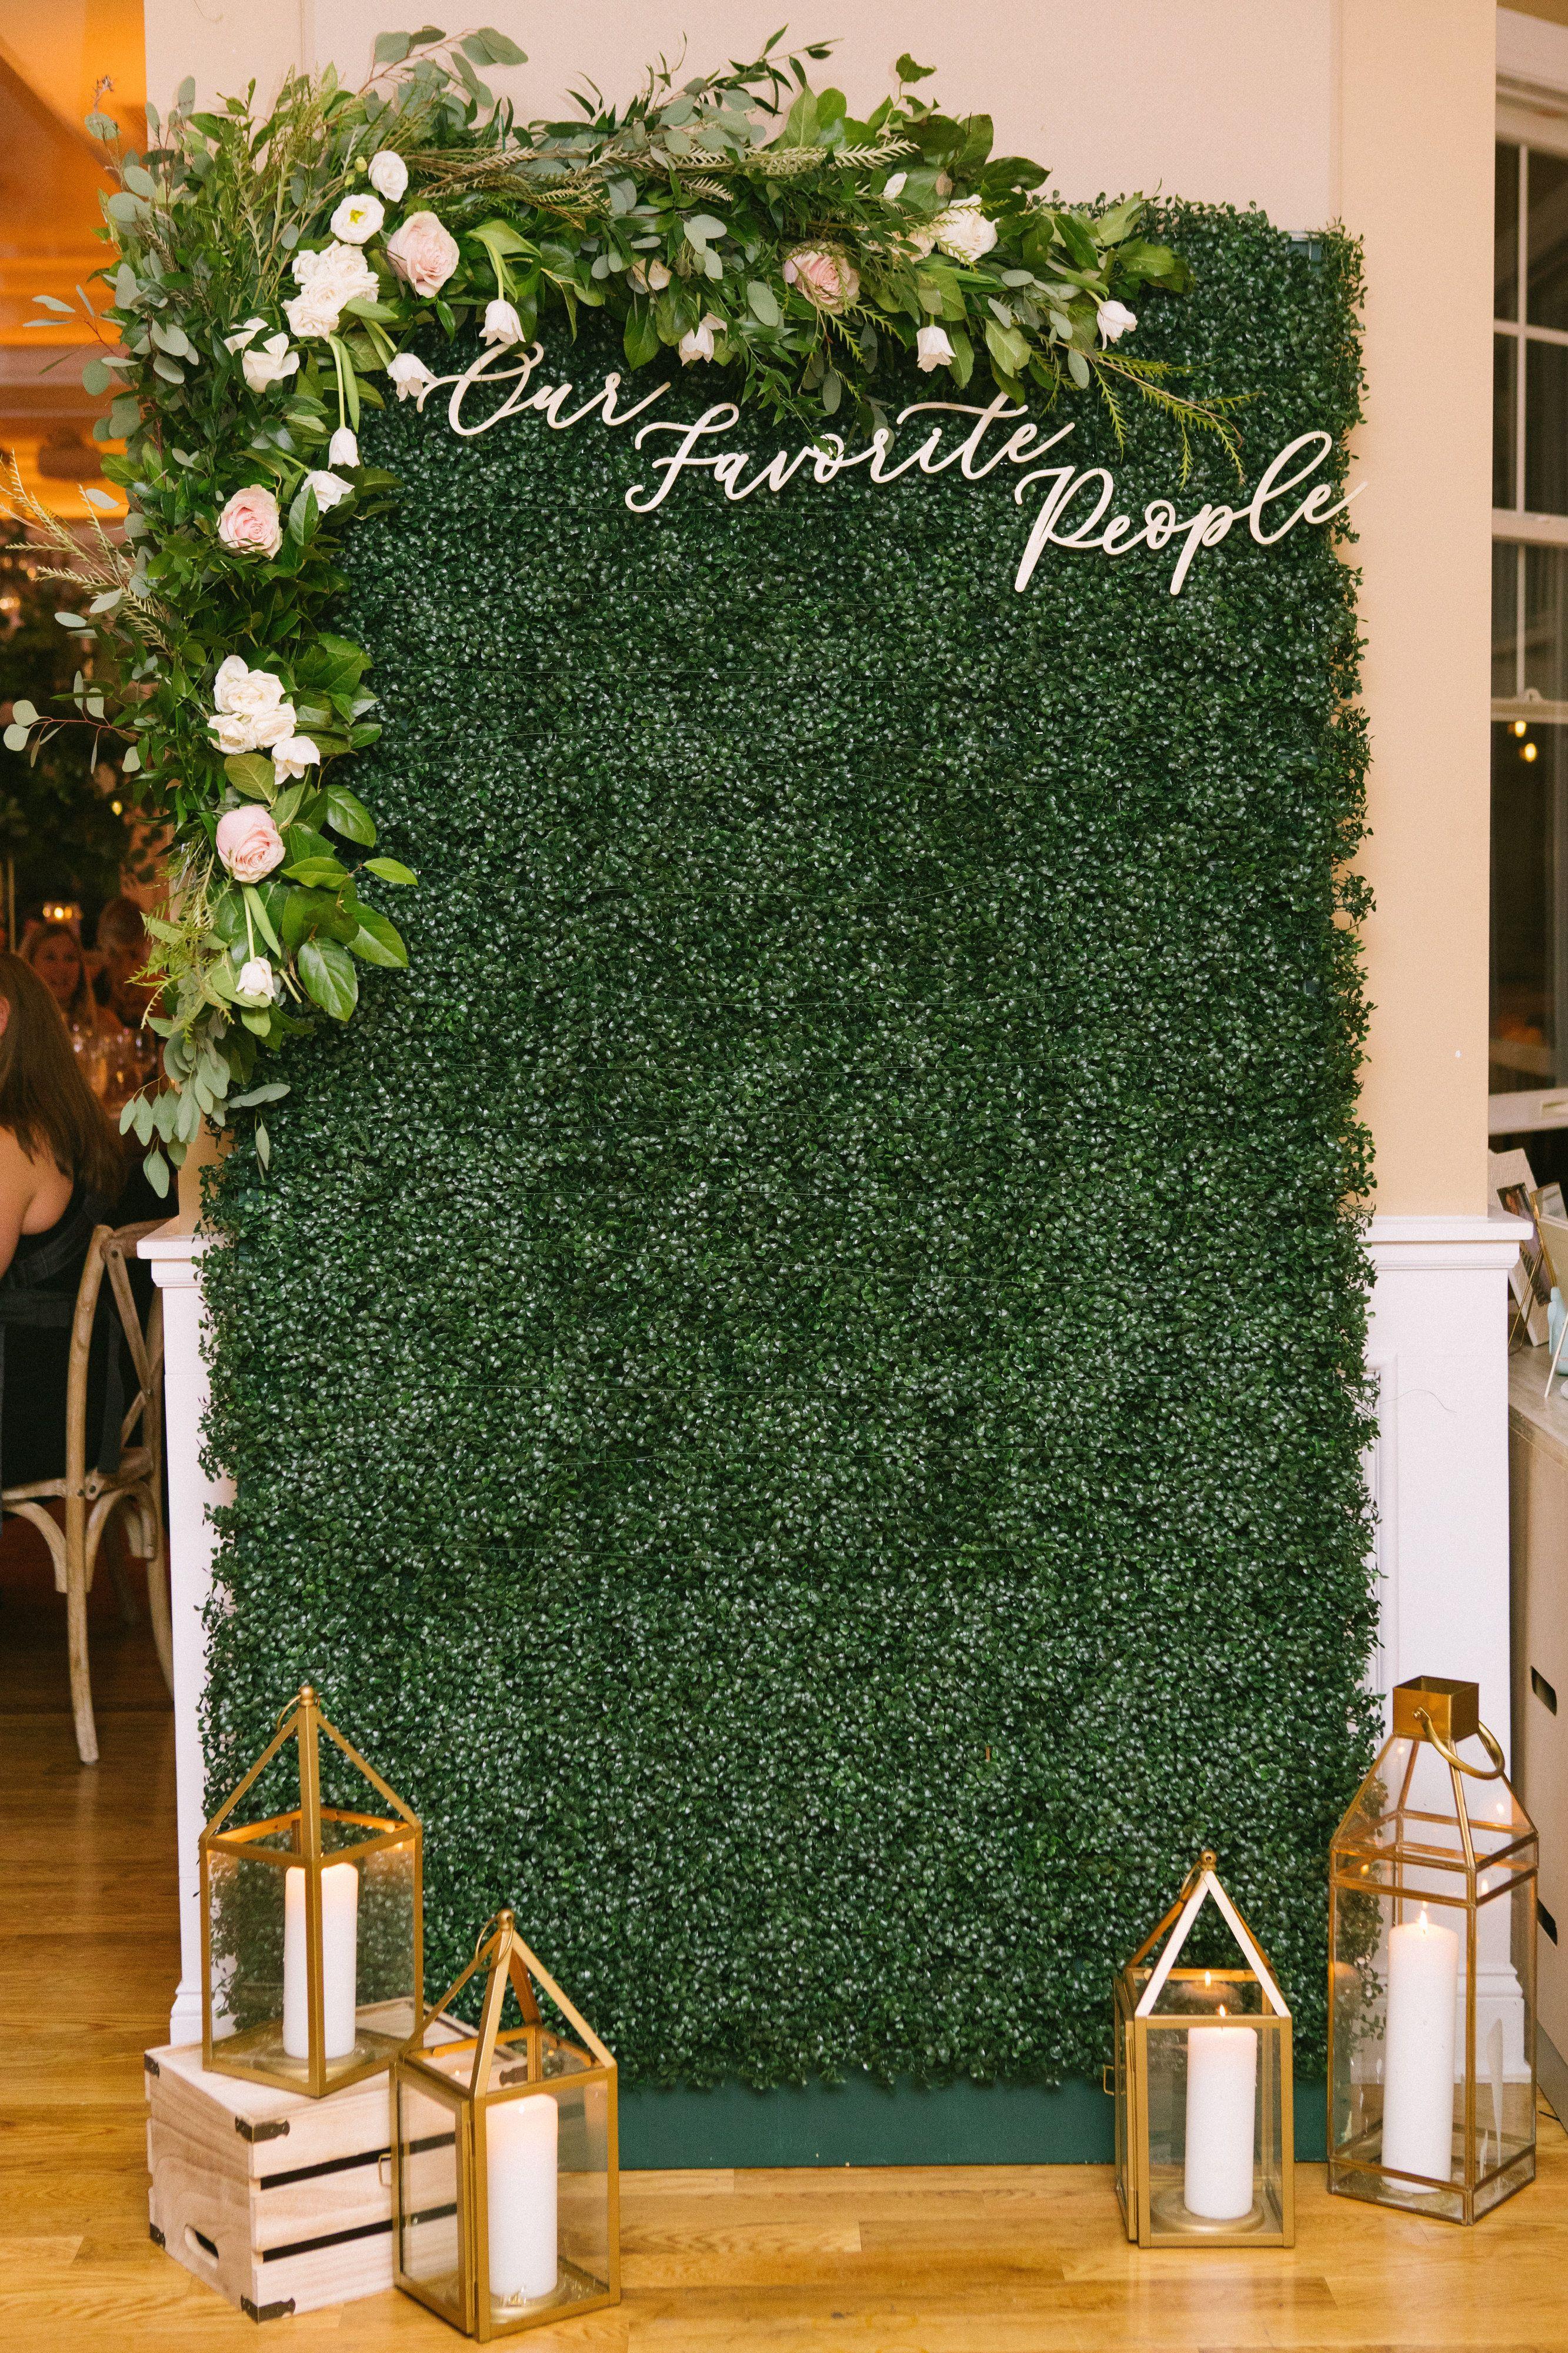 Wedding Photo Backdrop Greenery Photo Back Drop Nj Wedding Venue Bear Brook Valley Wedding Photo Walls Photo Backdrop Wedding Wall Backdrops